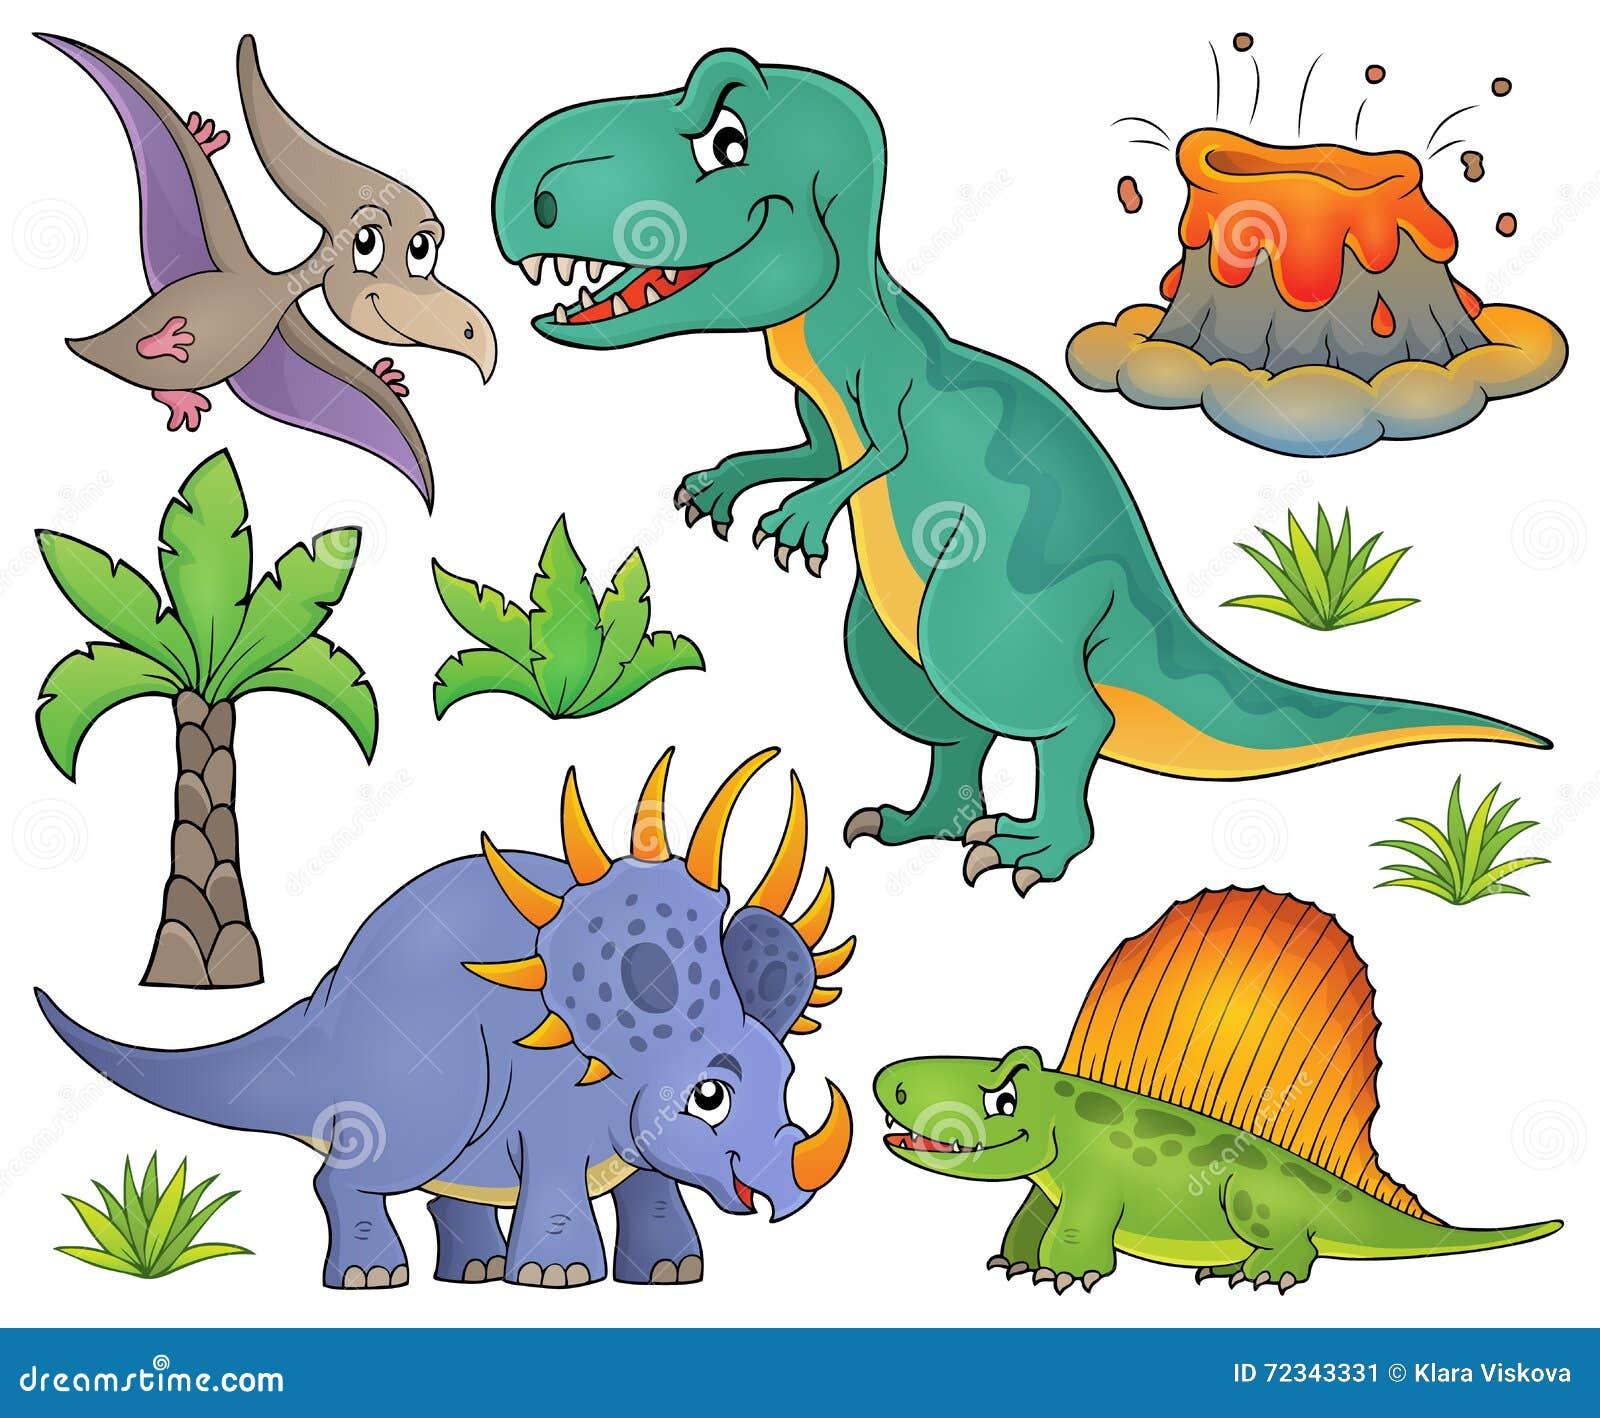 Styracosaurus Cartoons Illustrations Amp Vector Stock